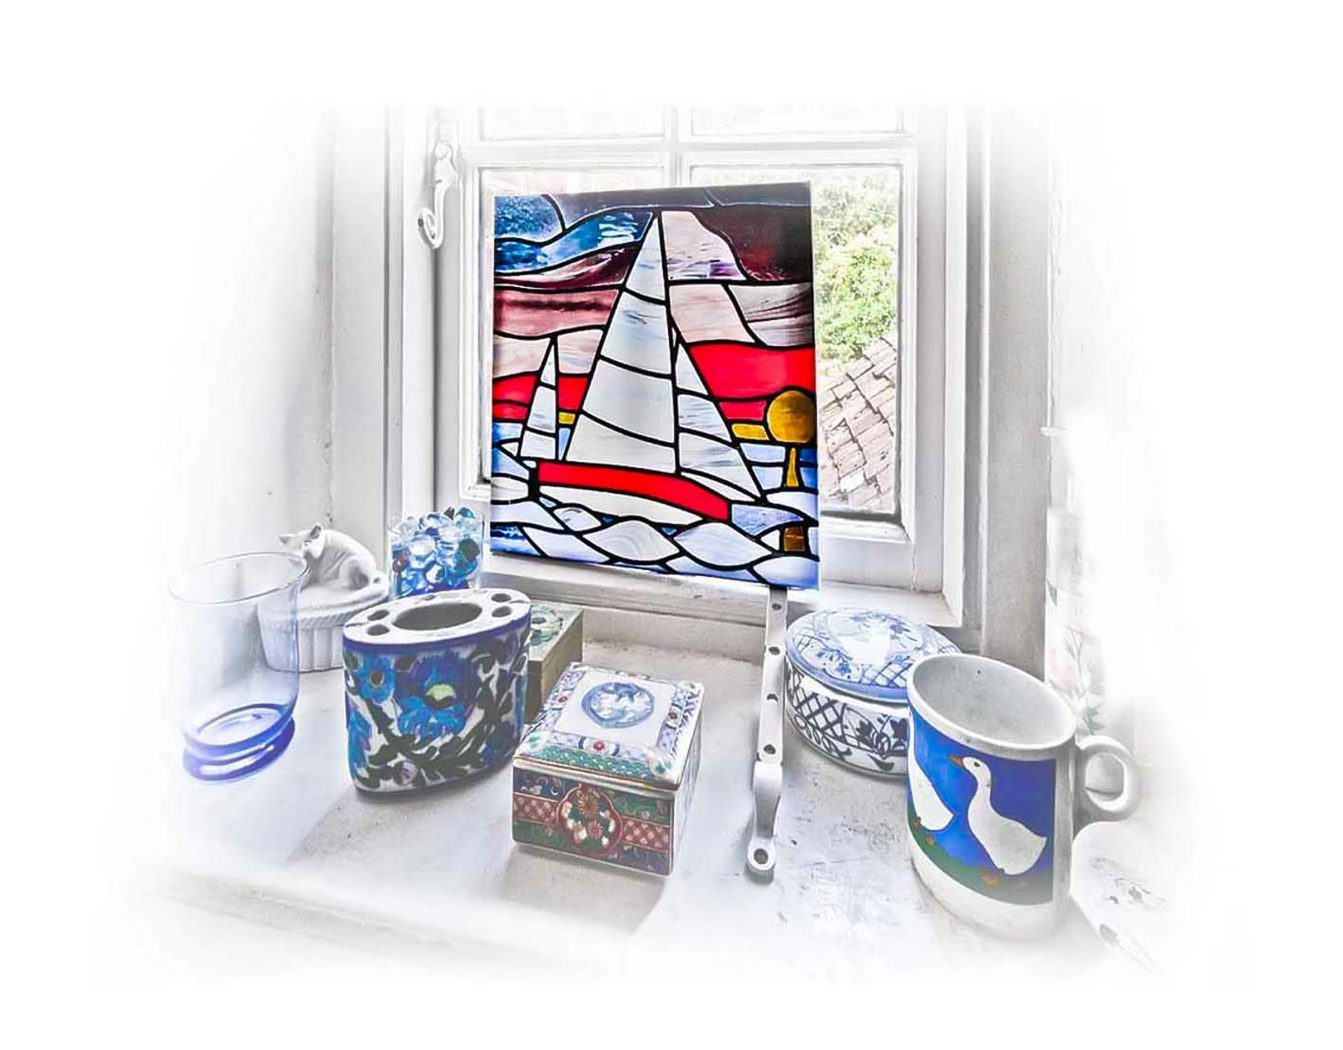 First 'Bathrooom Window' by Peter Read